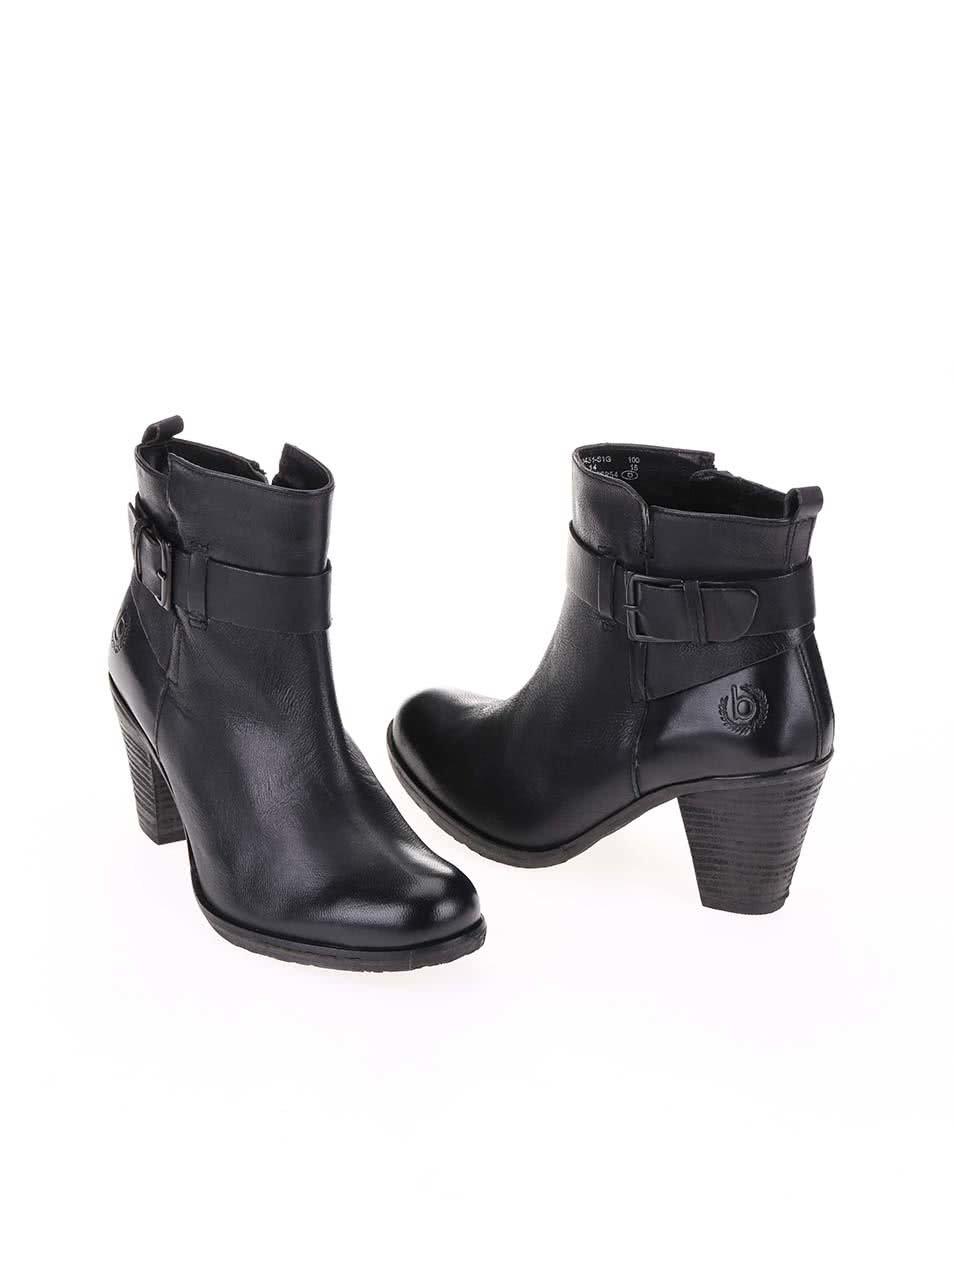 834553aa74 Čierne dámske kožené členkové topánky na podpätku bugatti Aurora ...